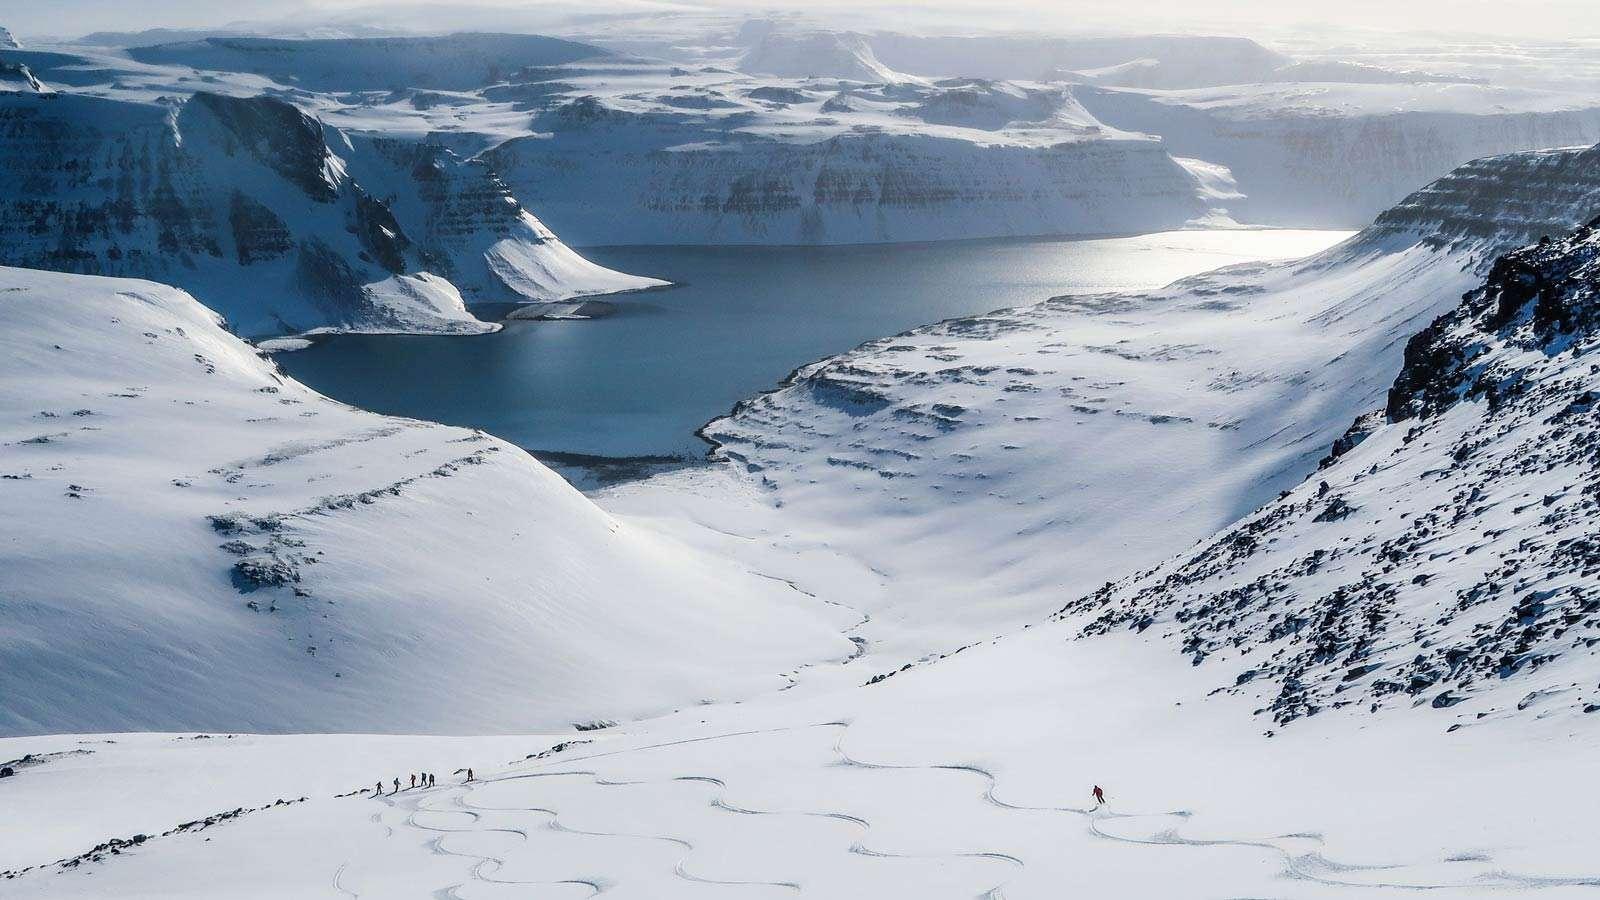 iceland ski and sail